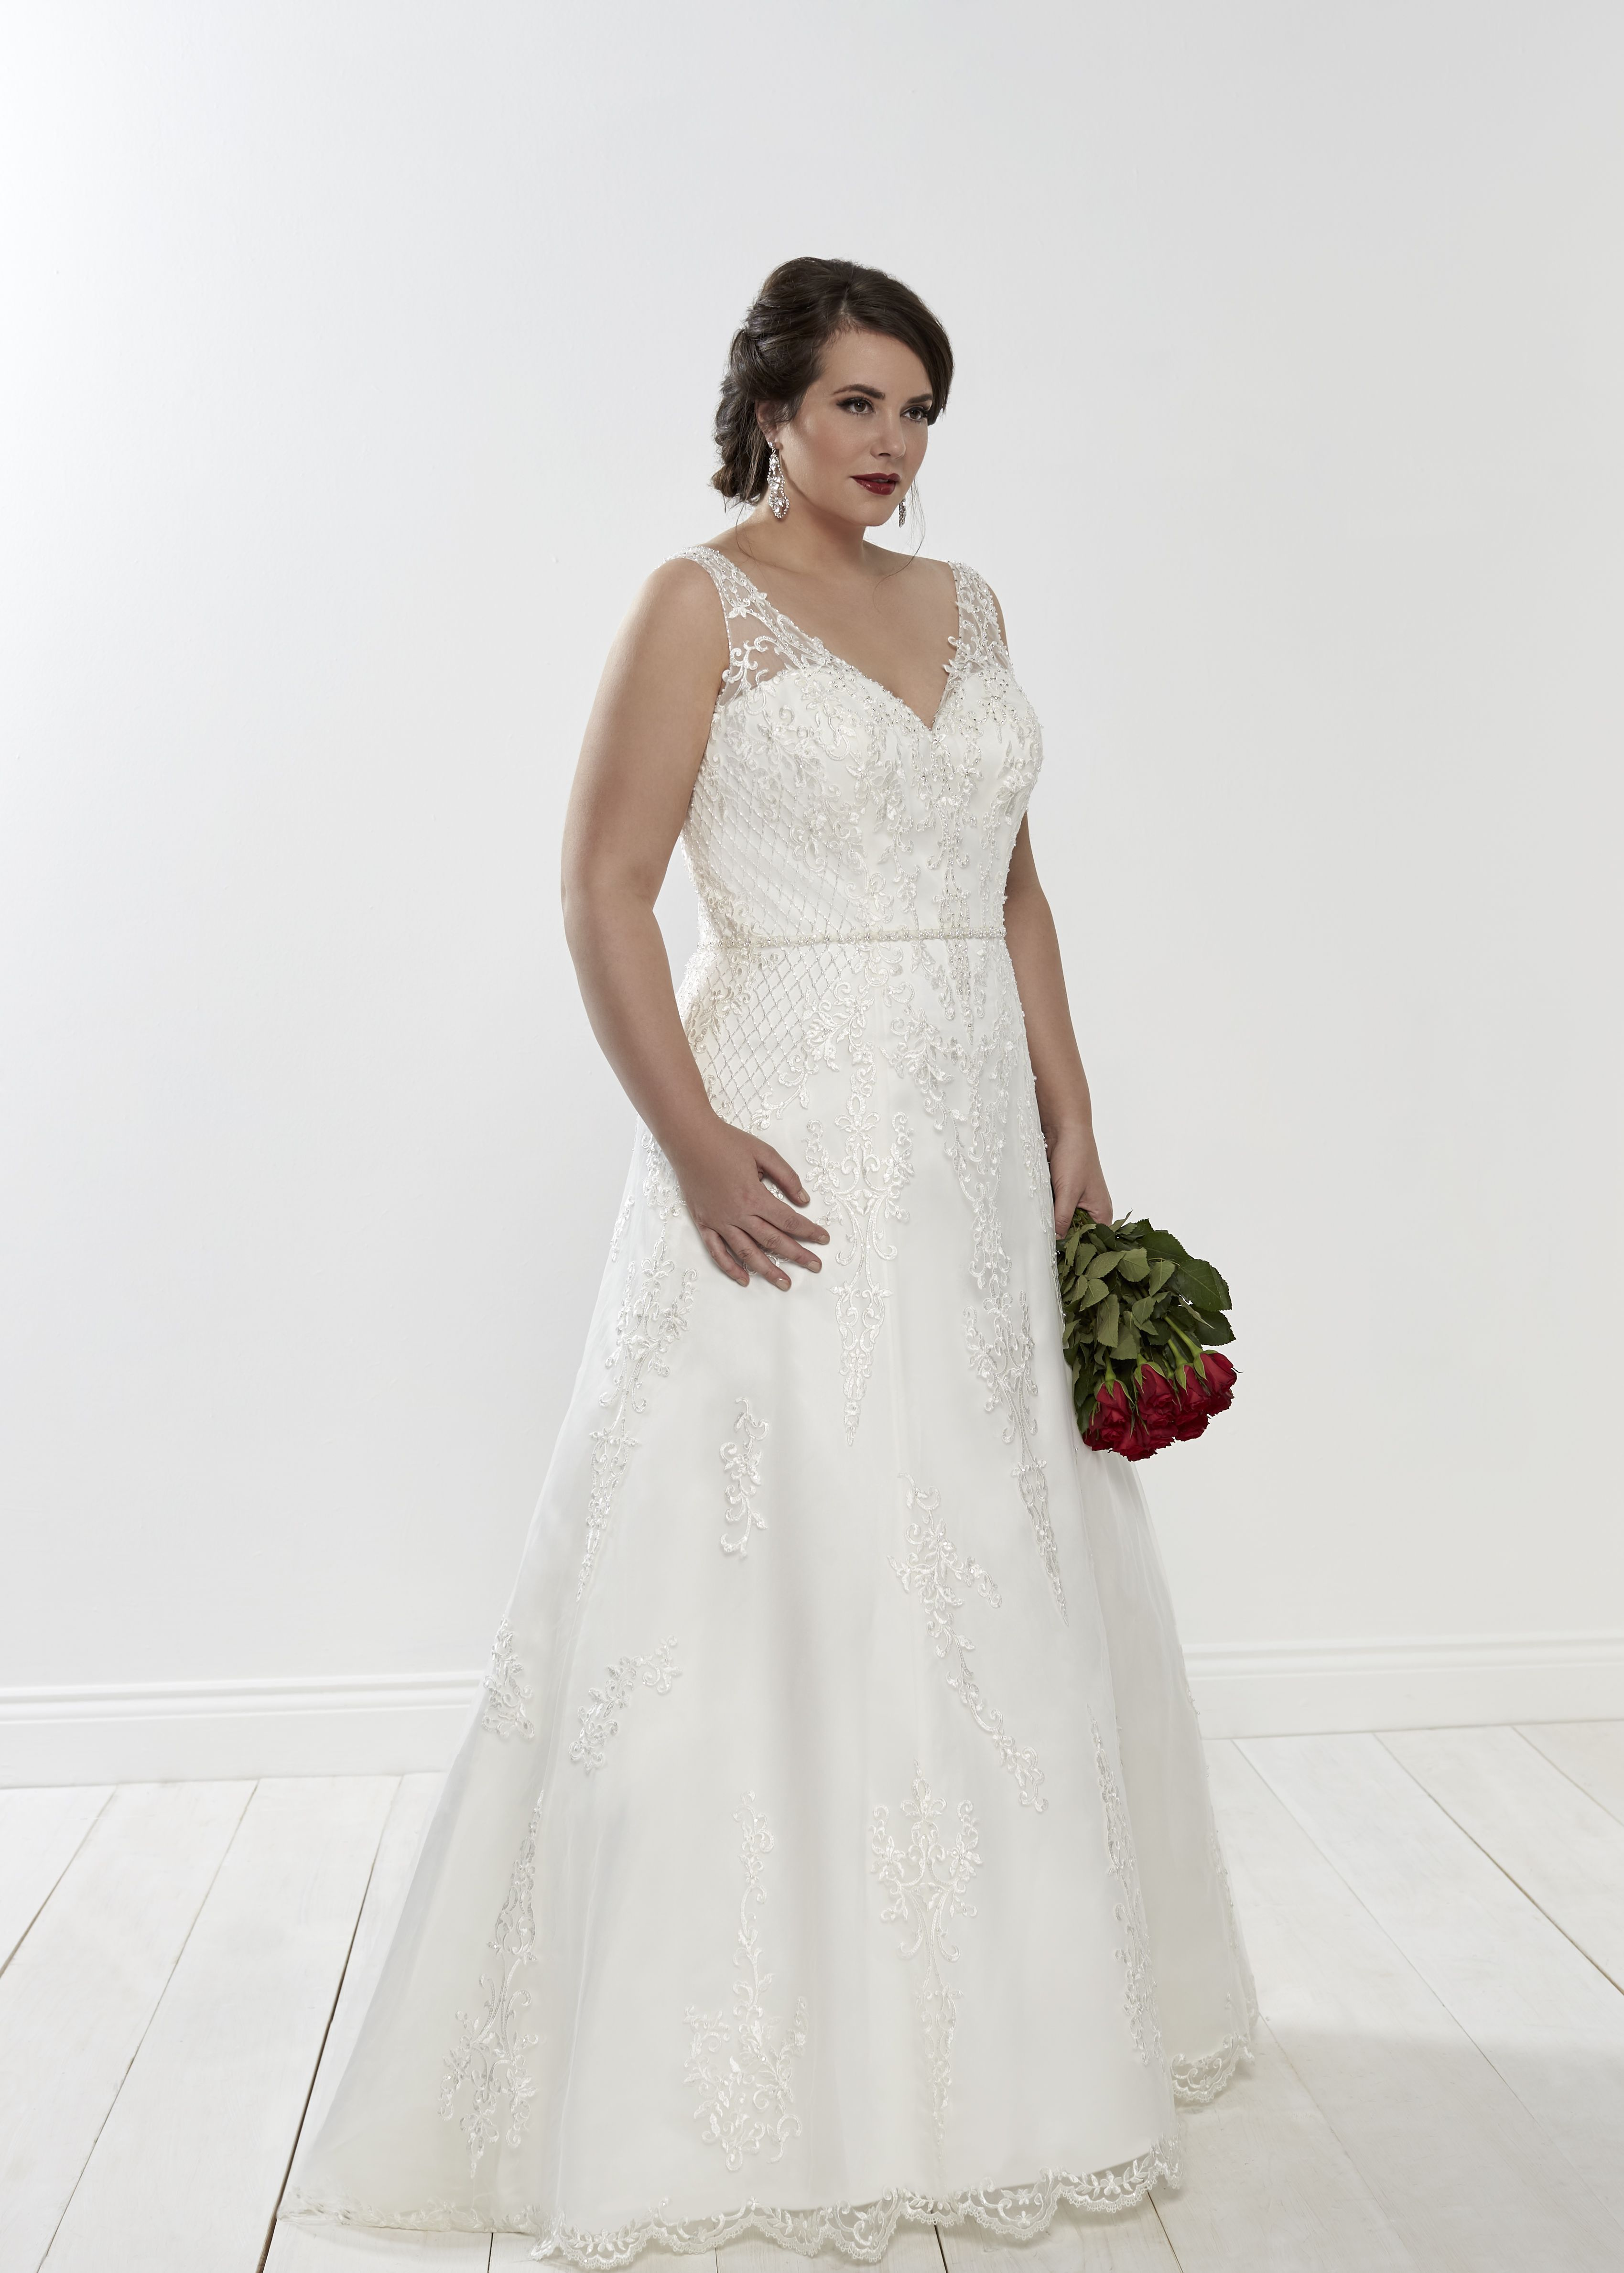 Topaz  romanticacollections  silhouette  silhouettebridal  bridal  bride   bridestyle  curvybride  plussize  wedding  weddingdress  illusion  ontrend  ... 30704200d6